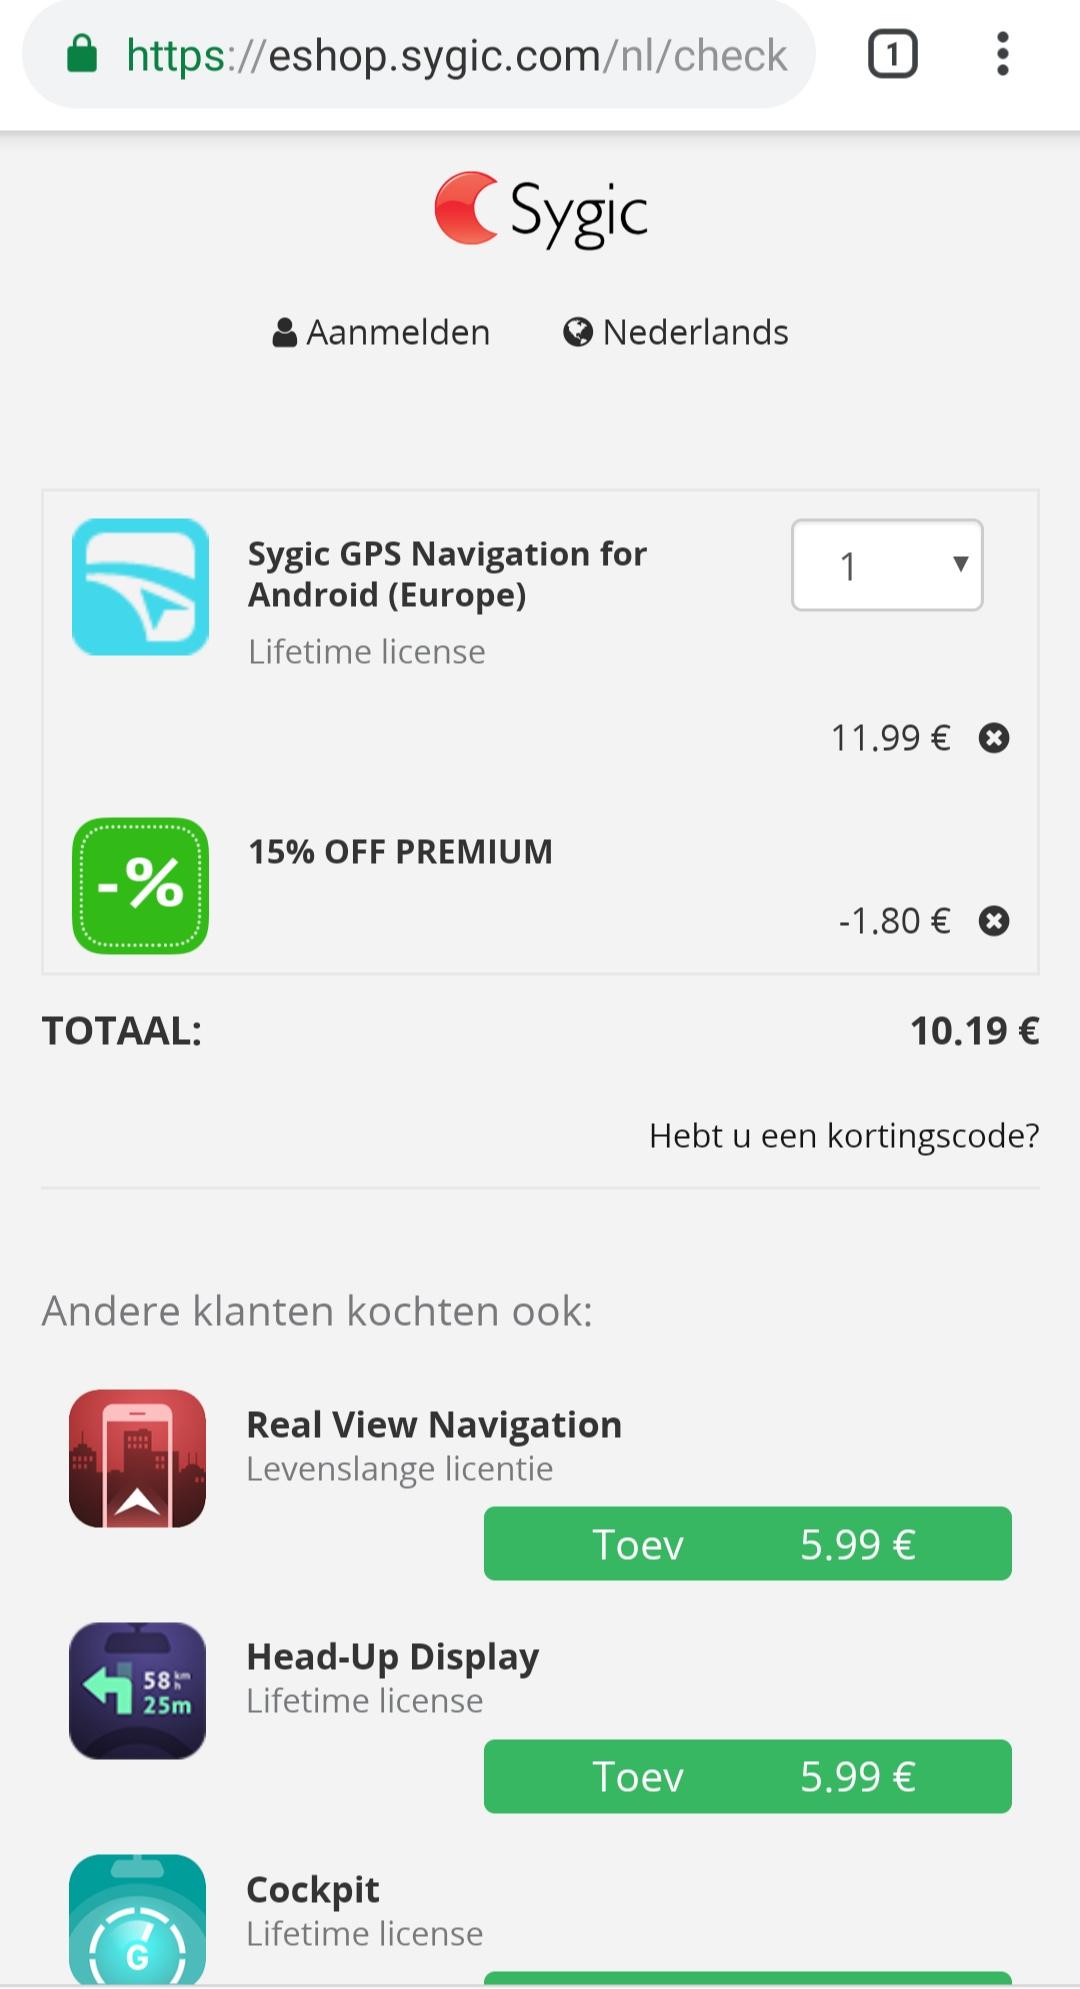 Nog eens 15% extra korting op Sygic Android producten